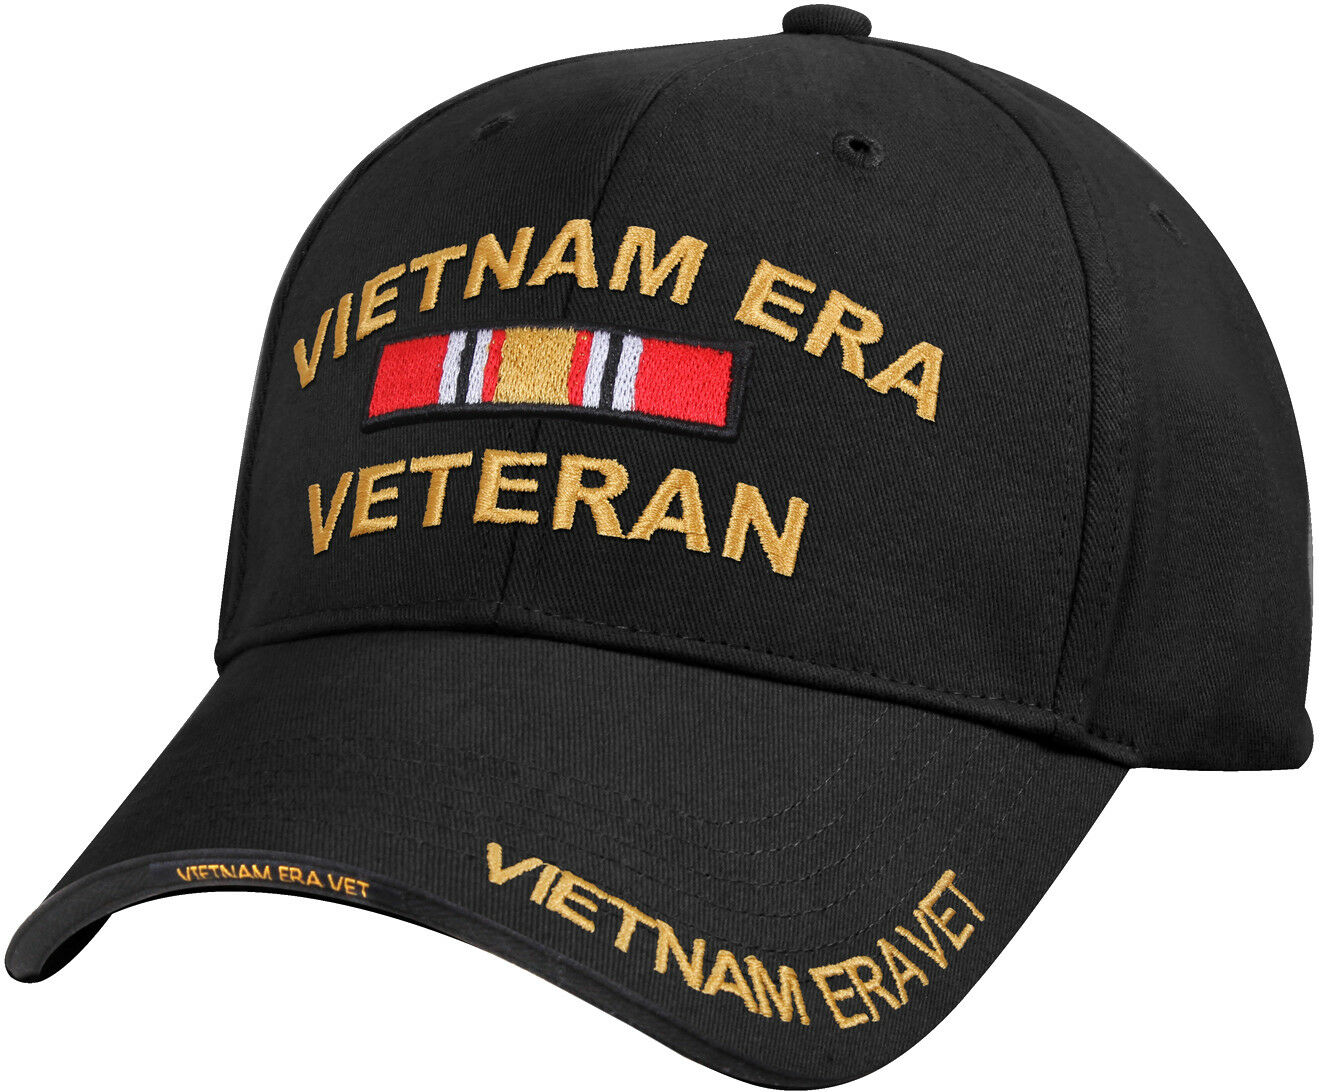 Black US Army Vietnam Vet Era Veteran Vet Vietnam Ribbon Baseball Hat Cap 8f9ede